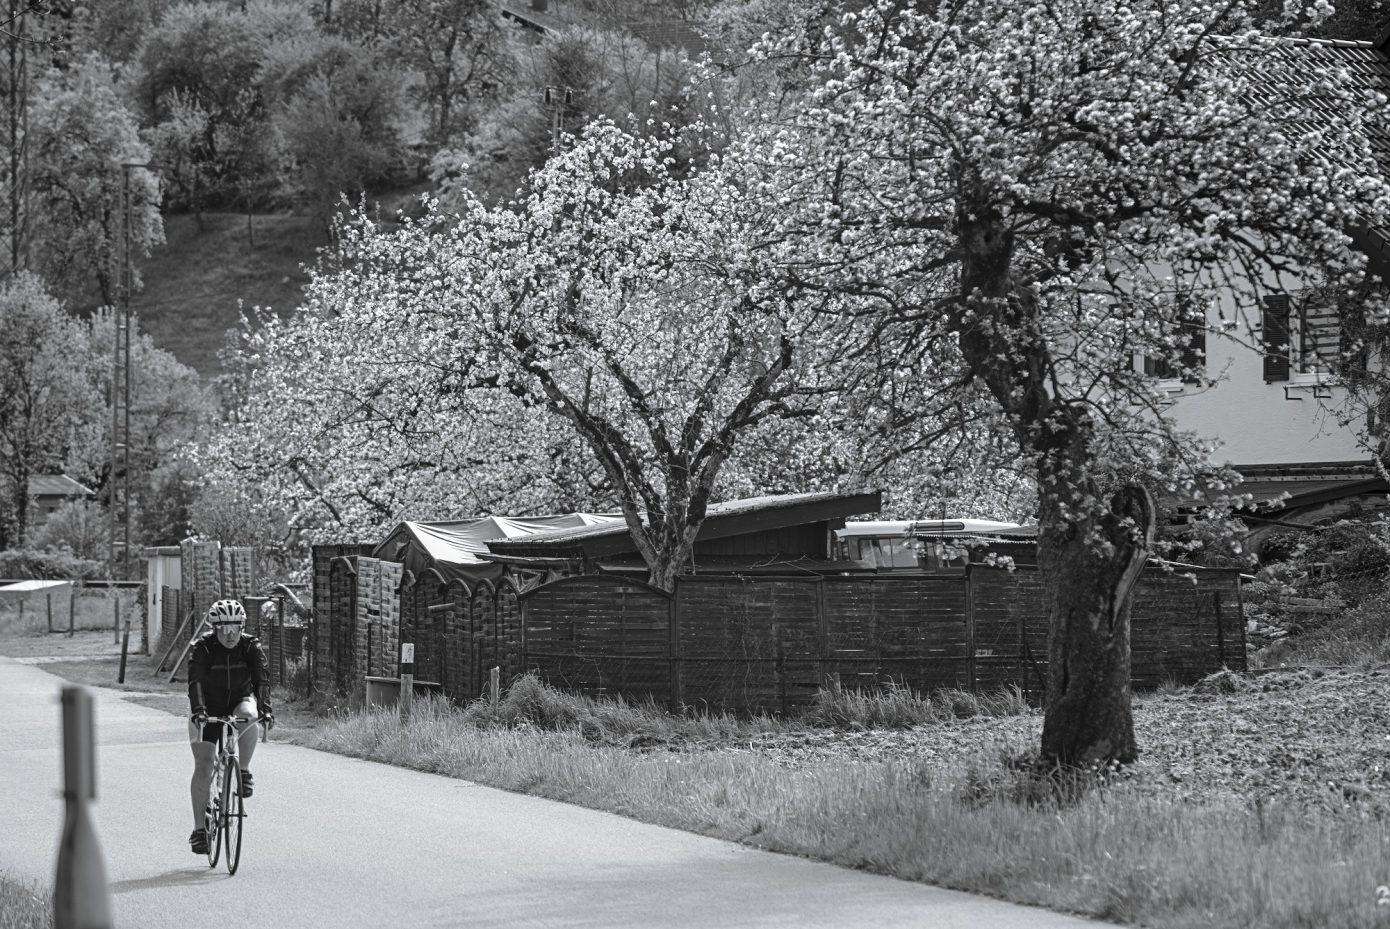 Apple_Trees_along_the_Road.jpg